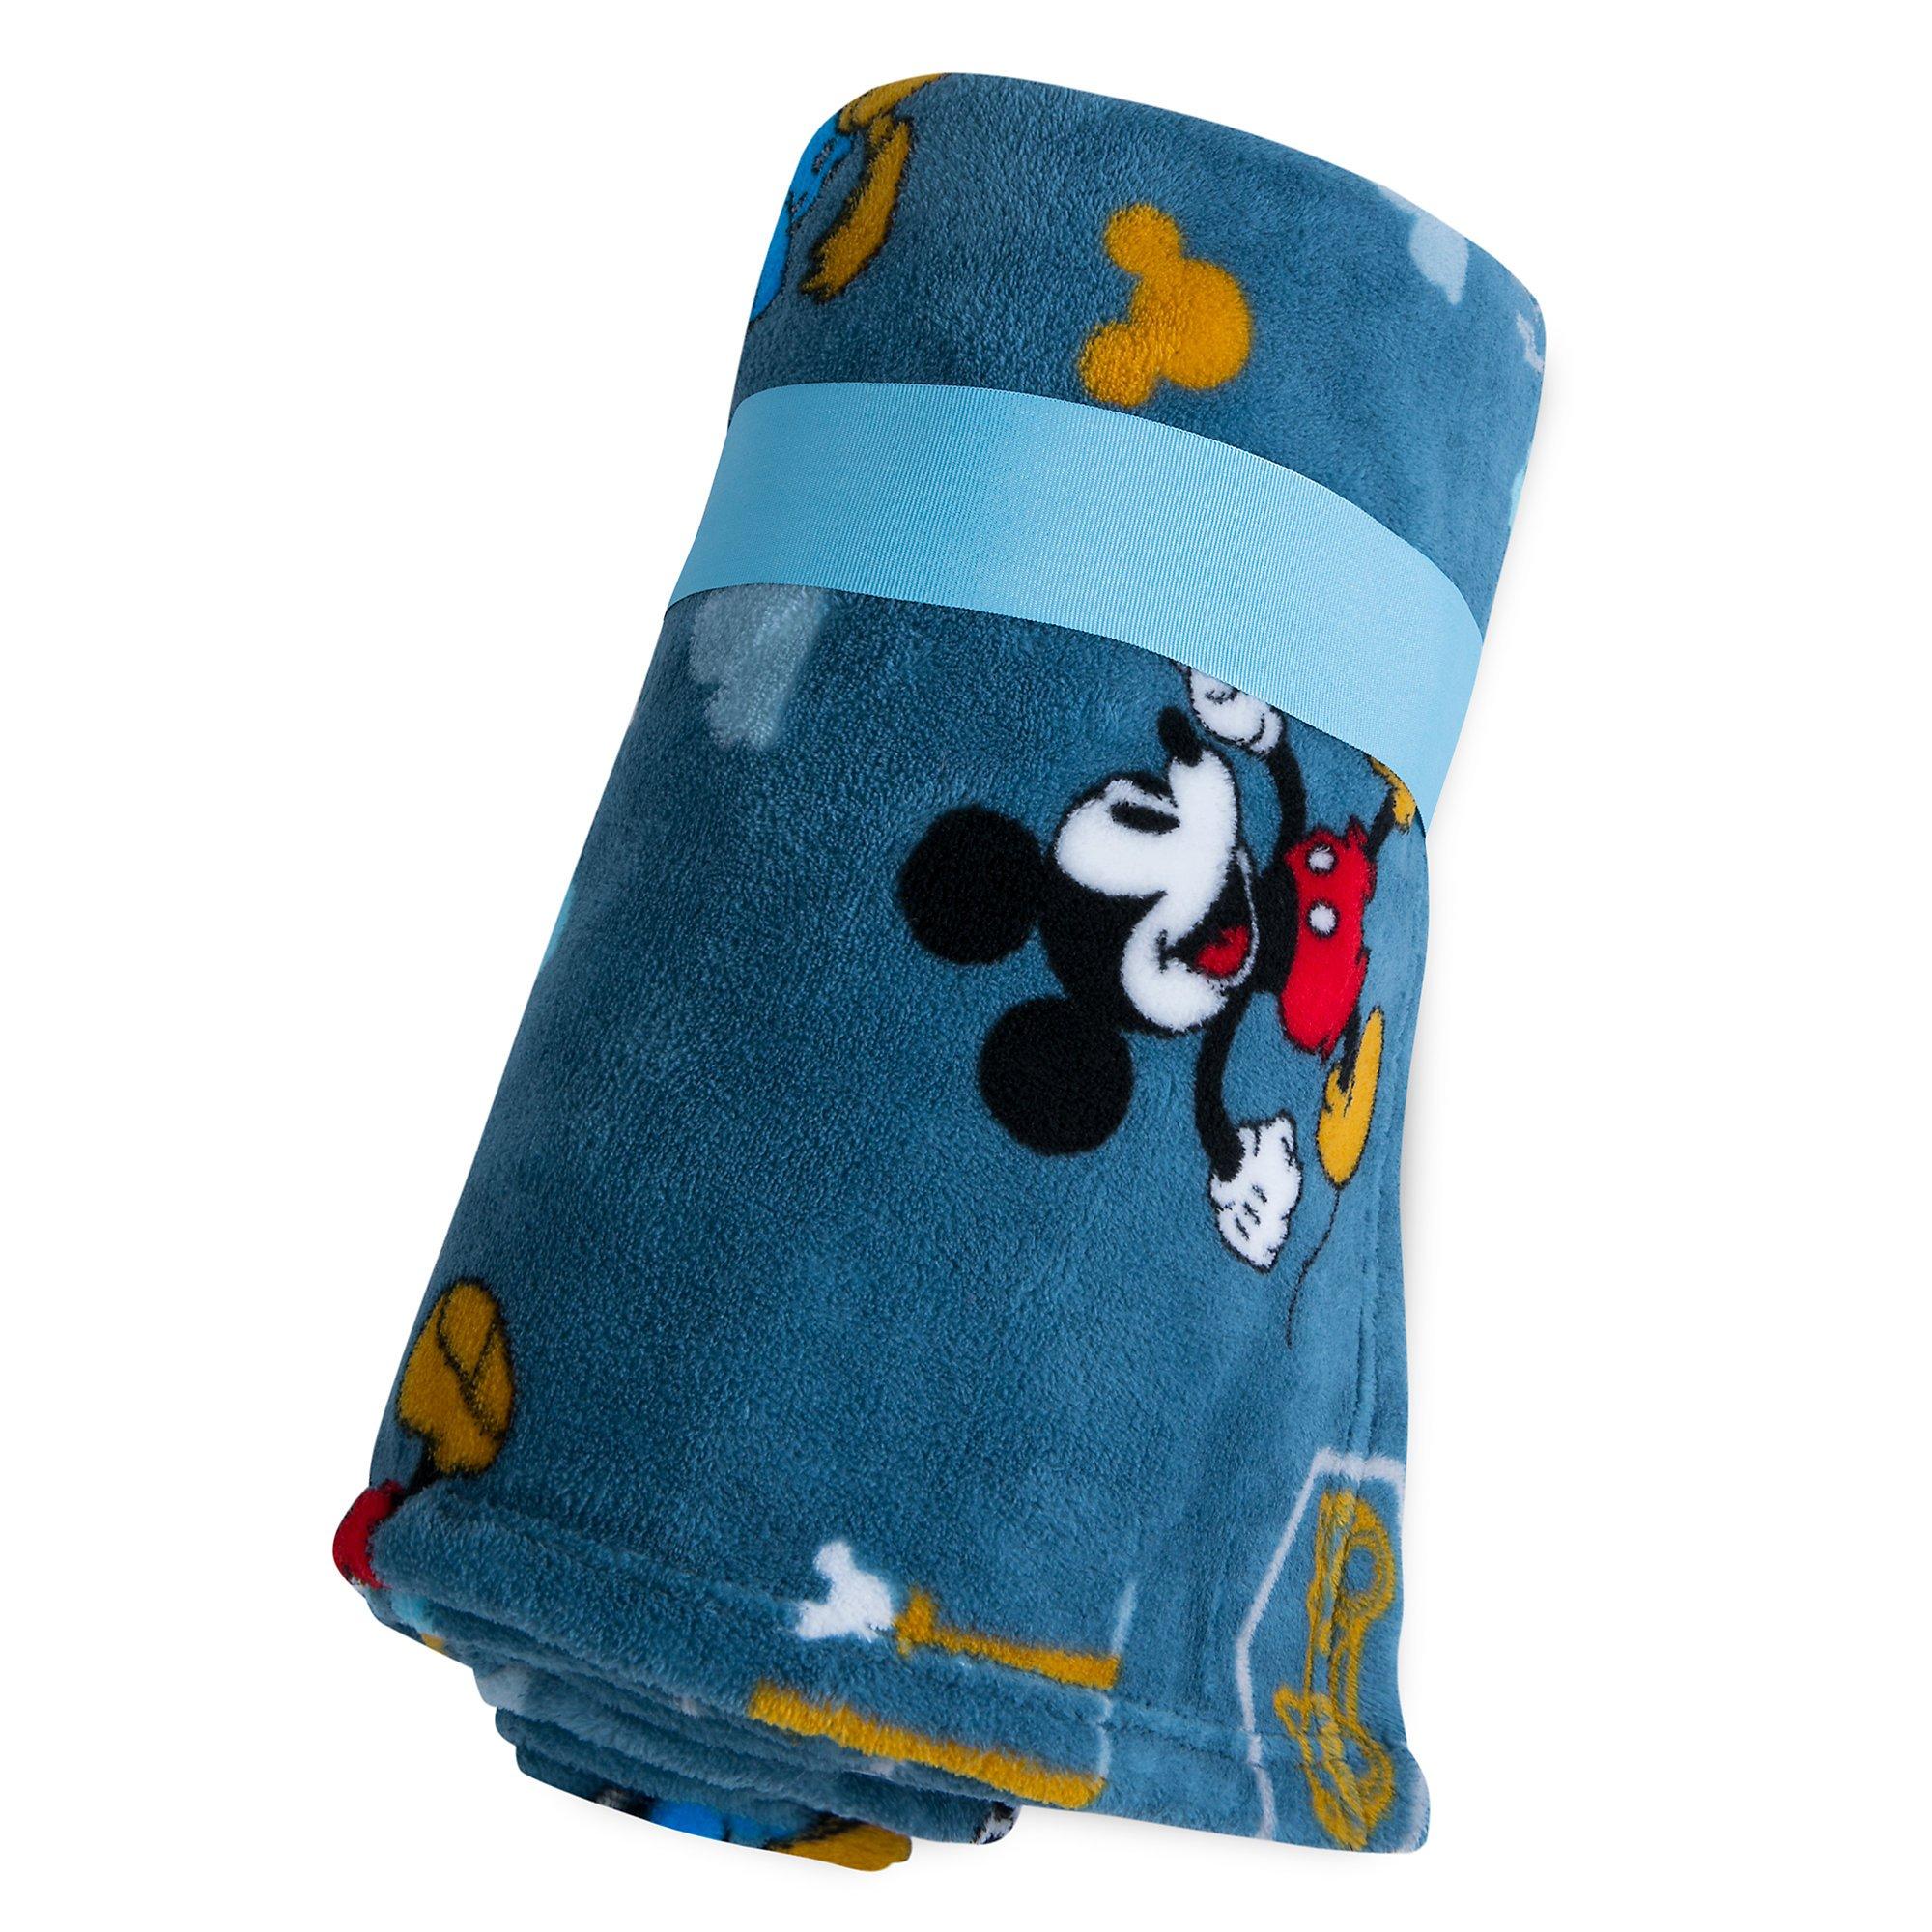 Disney Mickey Mouse, Donald Duck, and Pluto Fleece Throw - by Disney